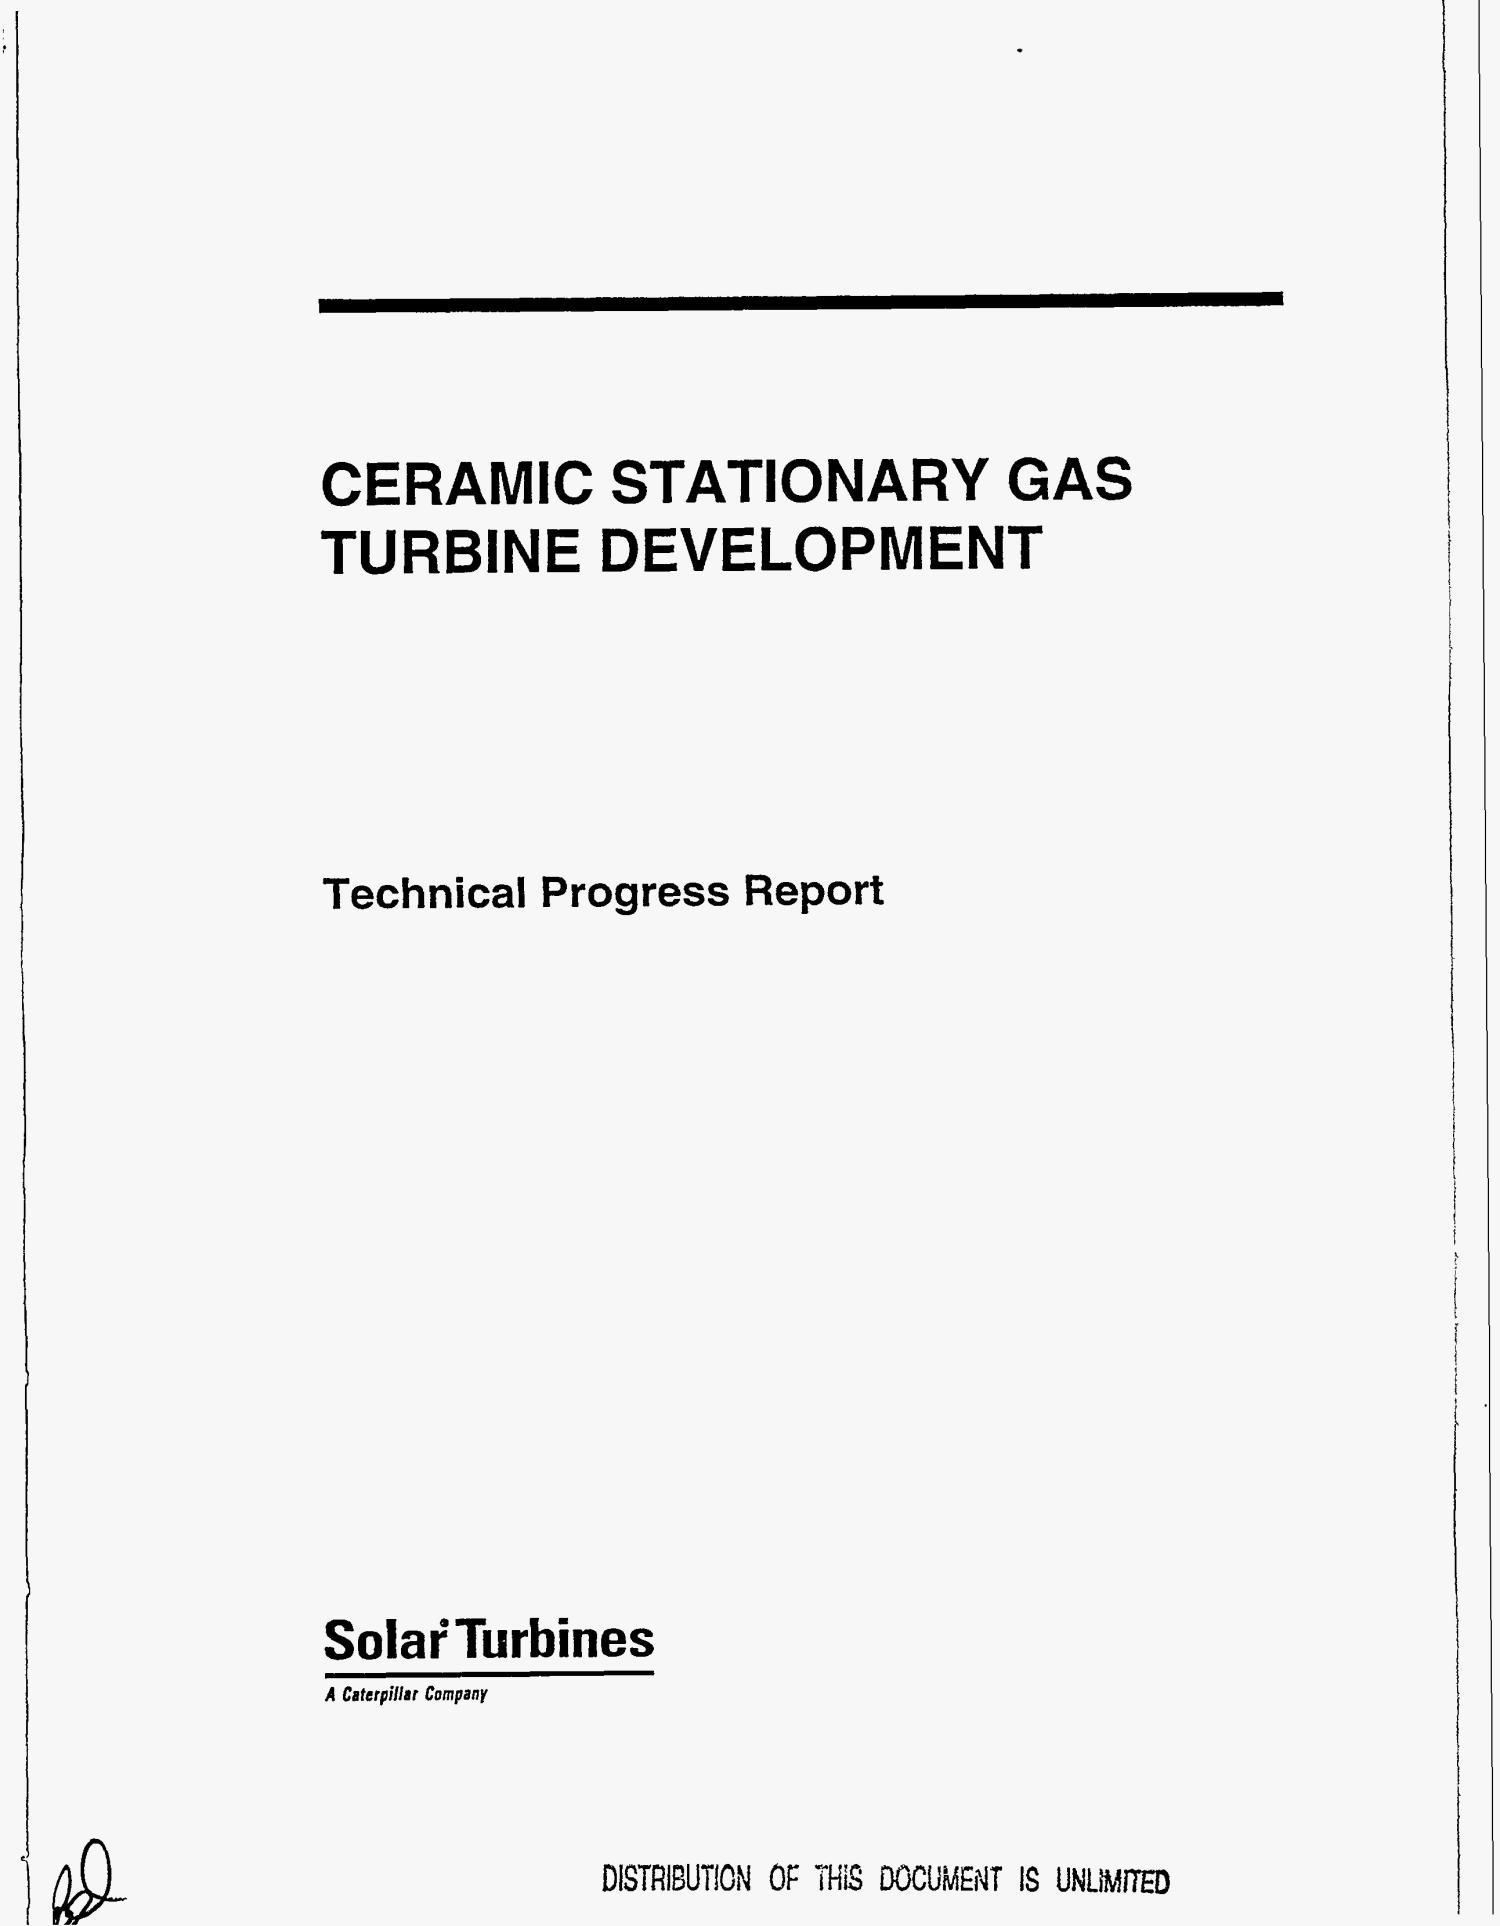 Ceramic Stationary Gas Turbine Development Technical progress